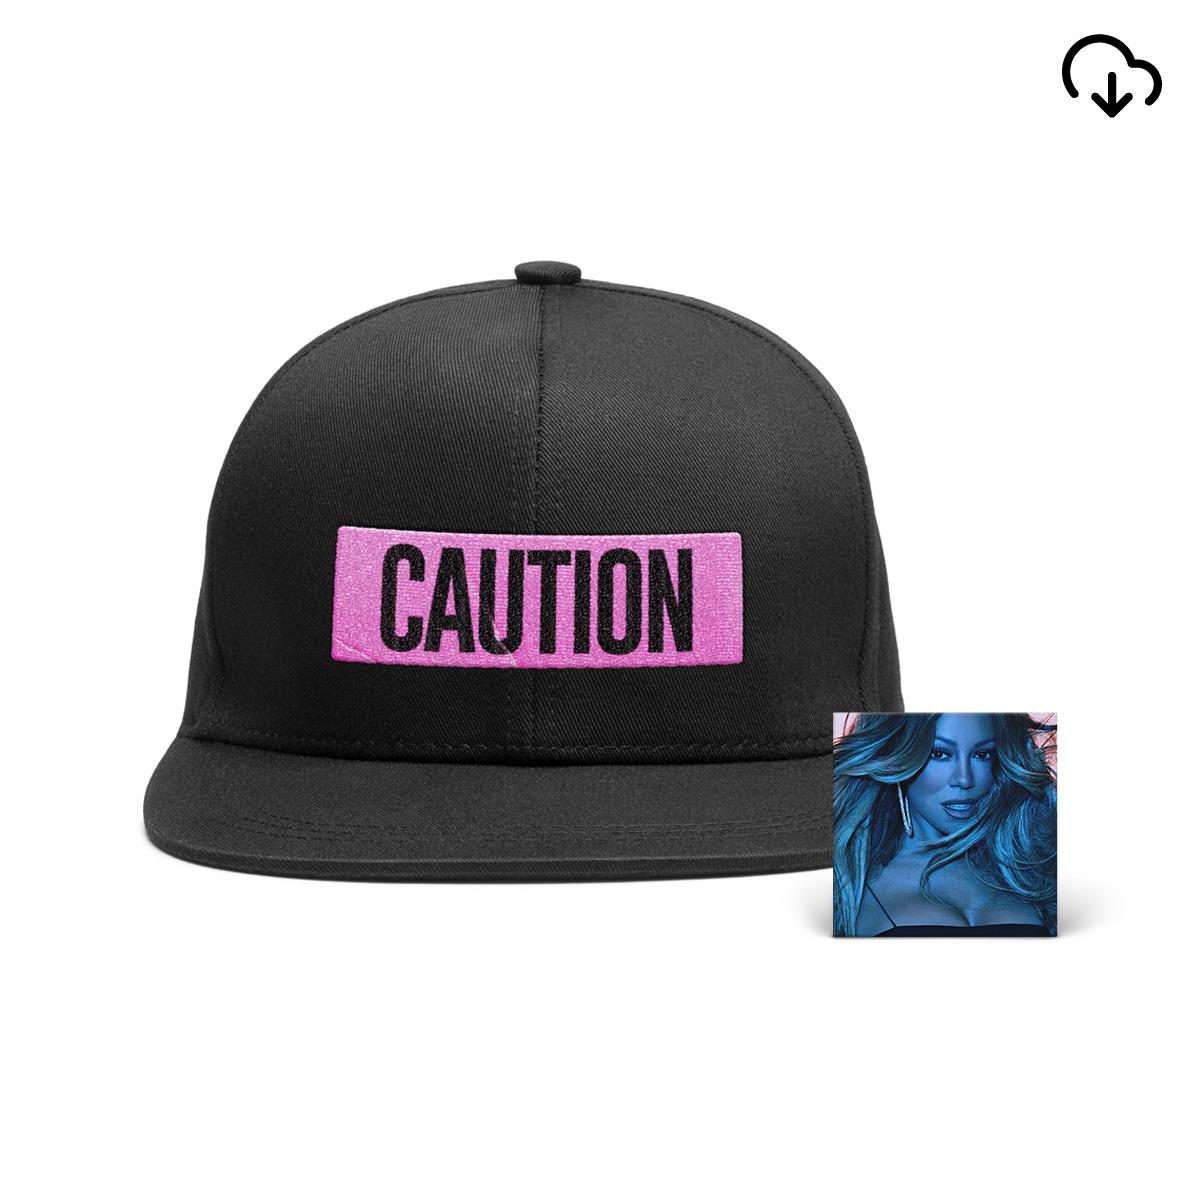 CAUTION Hat + Download